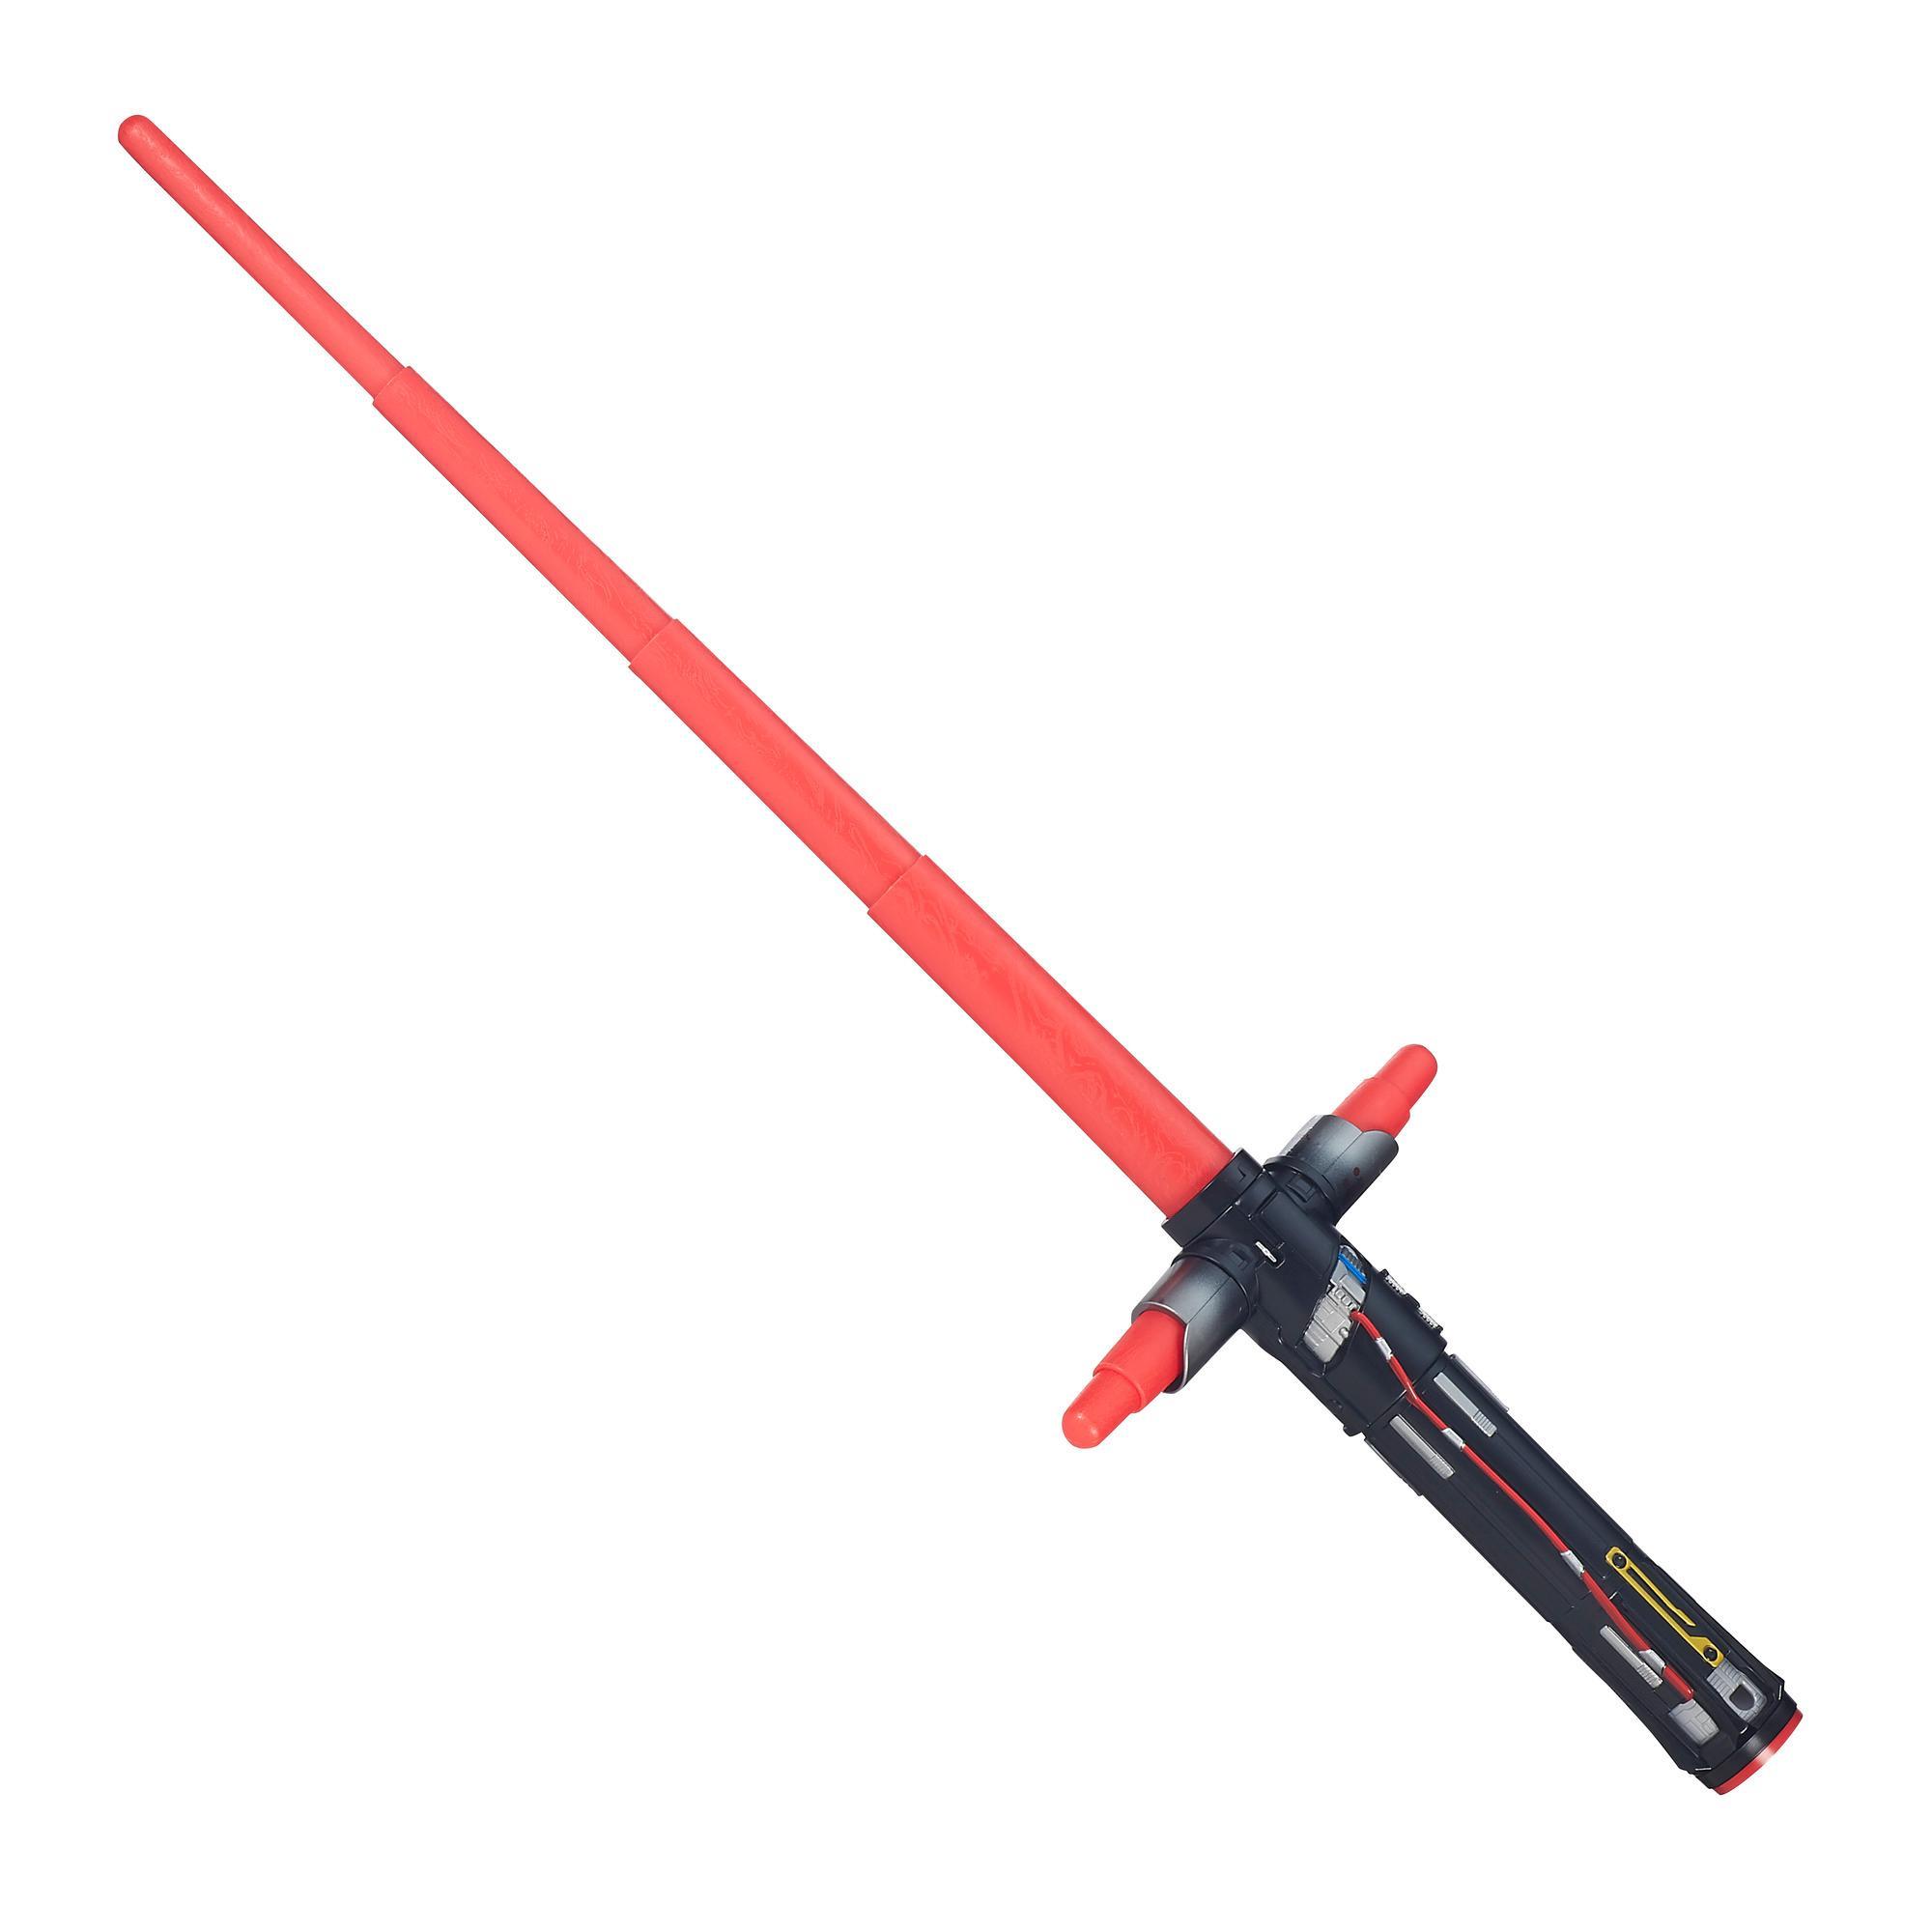 Star Wars O Despertar da Força Sabre de Luz Estendido de Kylo Ren